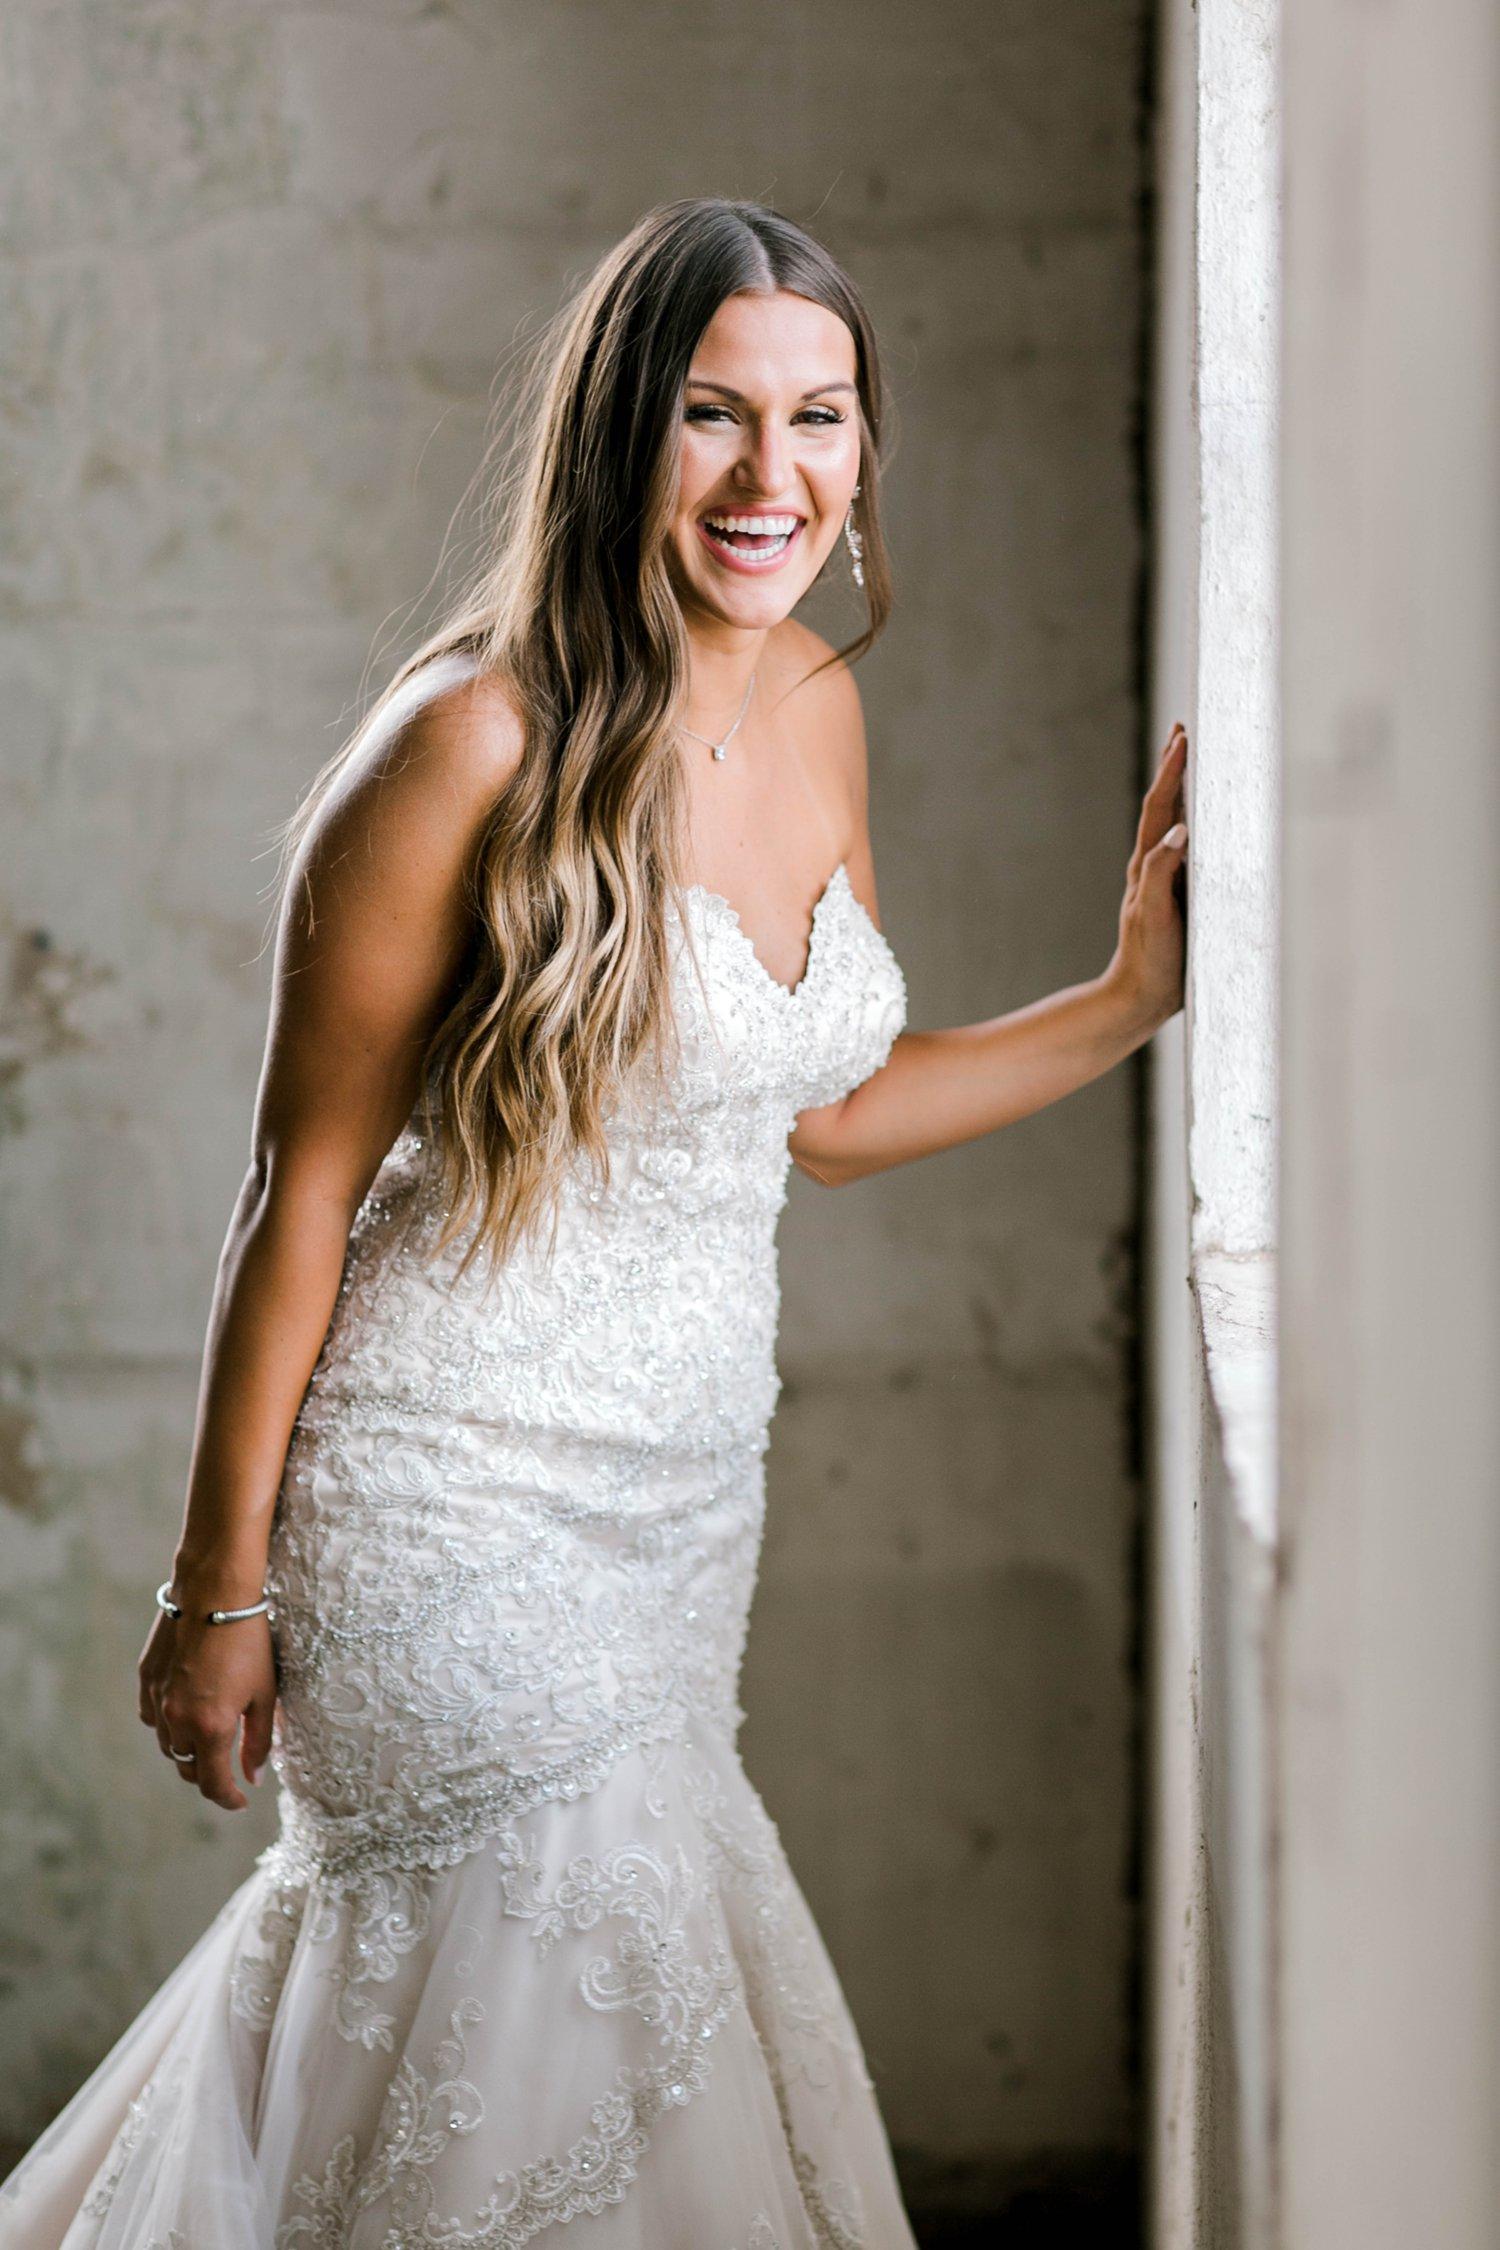 Kendra_Hill_Bridals_ALLEEJ_Lubbock_Wedding_Photographer_LHUCA_0029.jpg